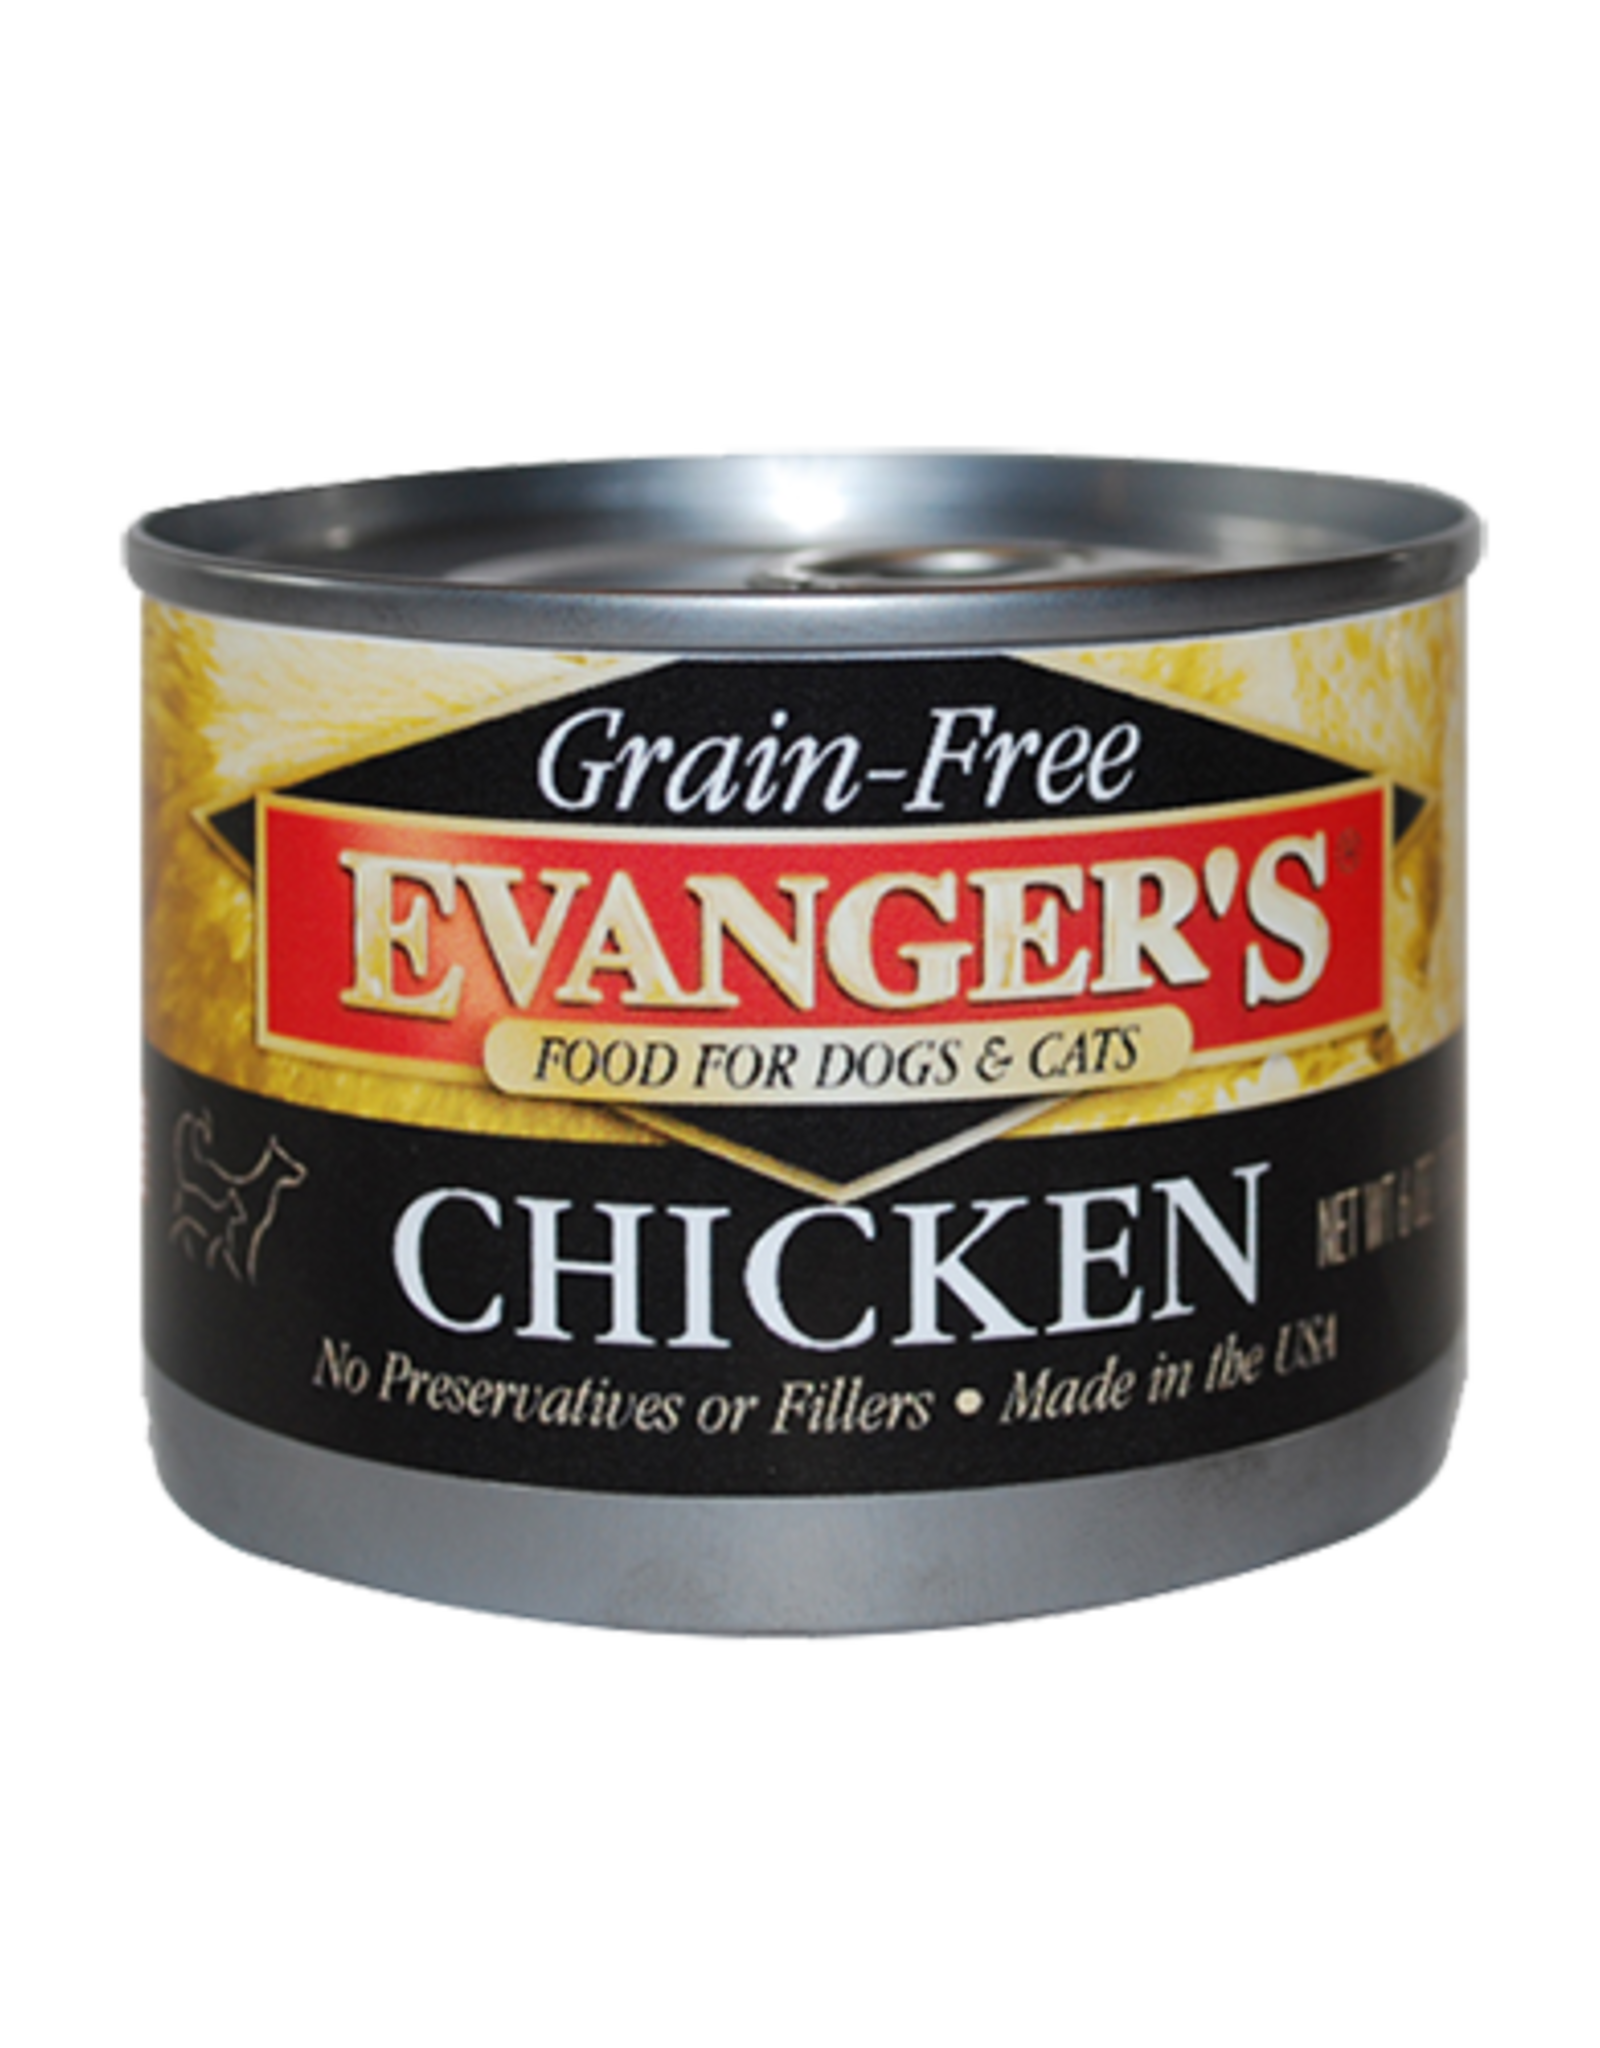 EVANGER'S EVANGERS GRAIN FREE COOKED CHICKEN 13OZ CASE OF 12